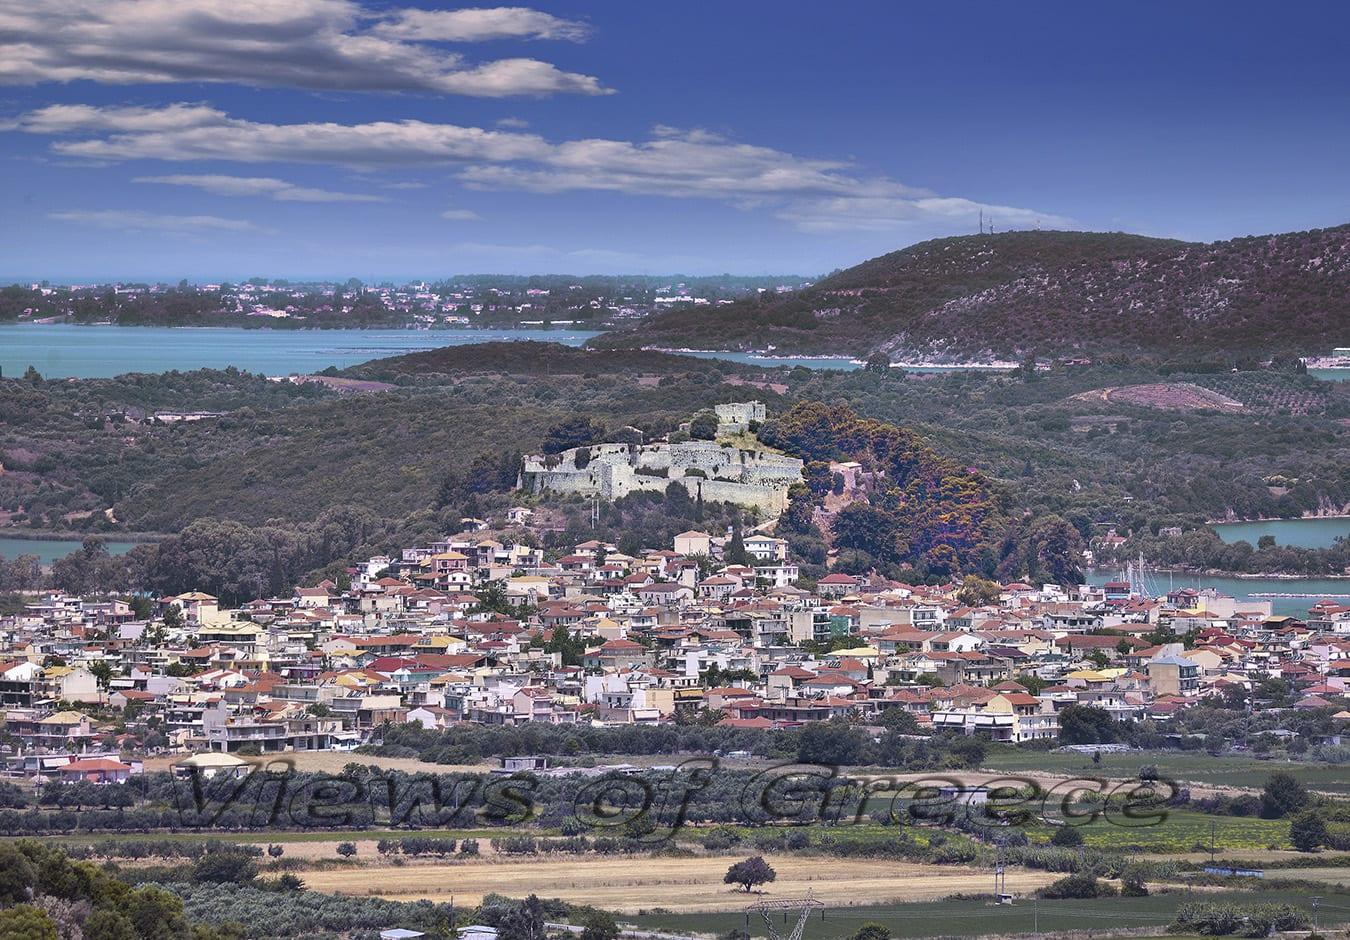 vonitsa, beach, port, castle, historical, etoloakarnania, marina, yachts, greece, amvrakikos, nature, greek, wetland, , lagoon, ambracian gulf, Birdwatching, Αμβρακικός κόλπος, παρατήρηση πουλιών, δελφινάκια Αμβρακικού, Βόνιτσα, κάστρο, παραλίες, λίμνη Κομήτης, Κουκουμίτσα